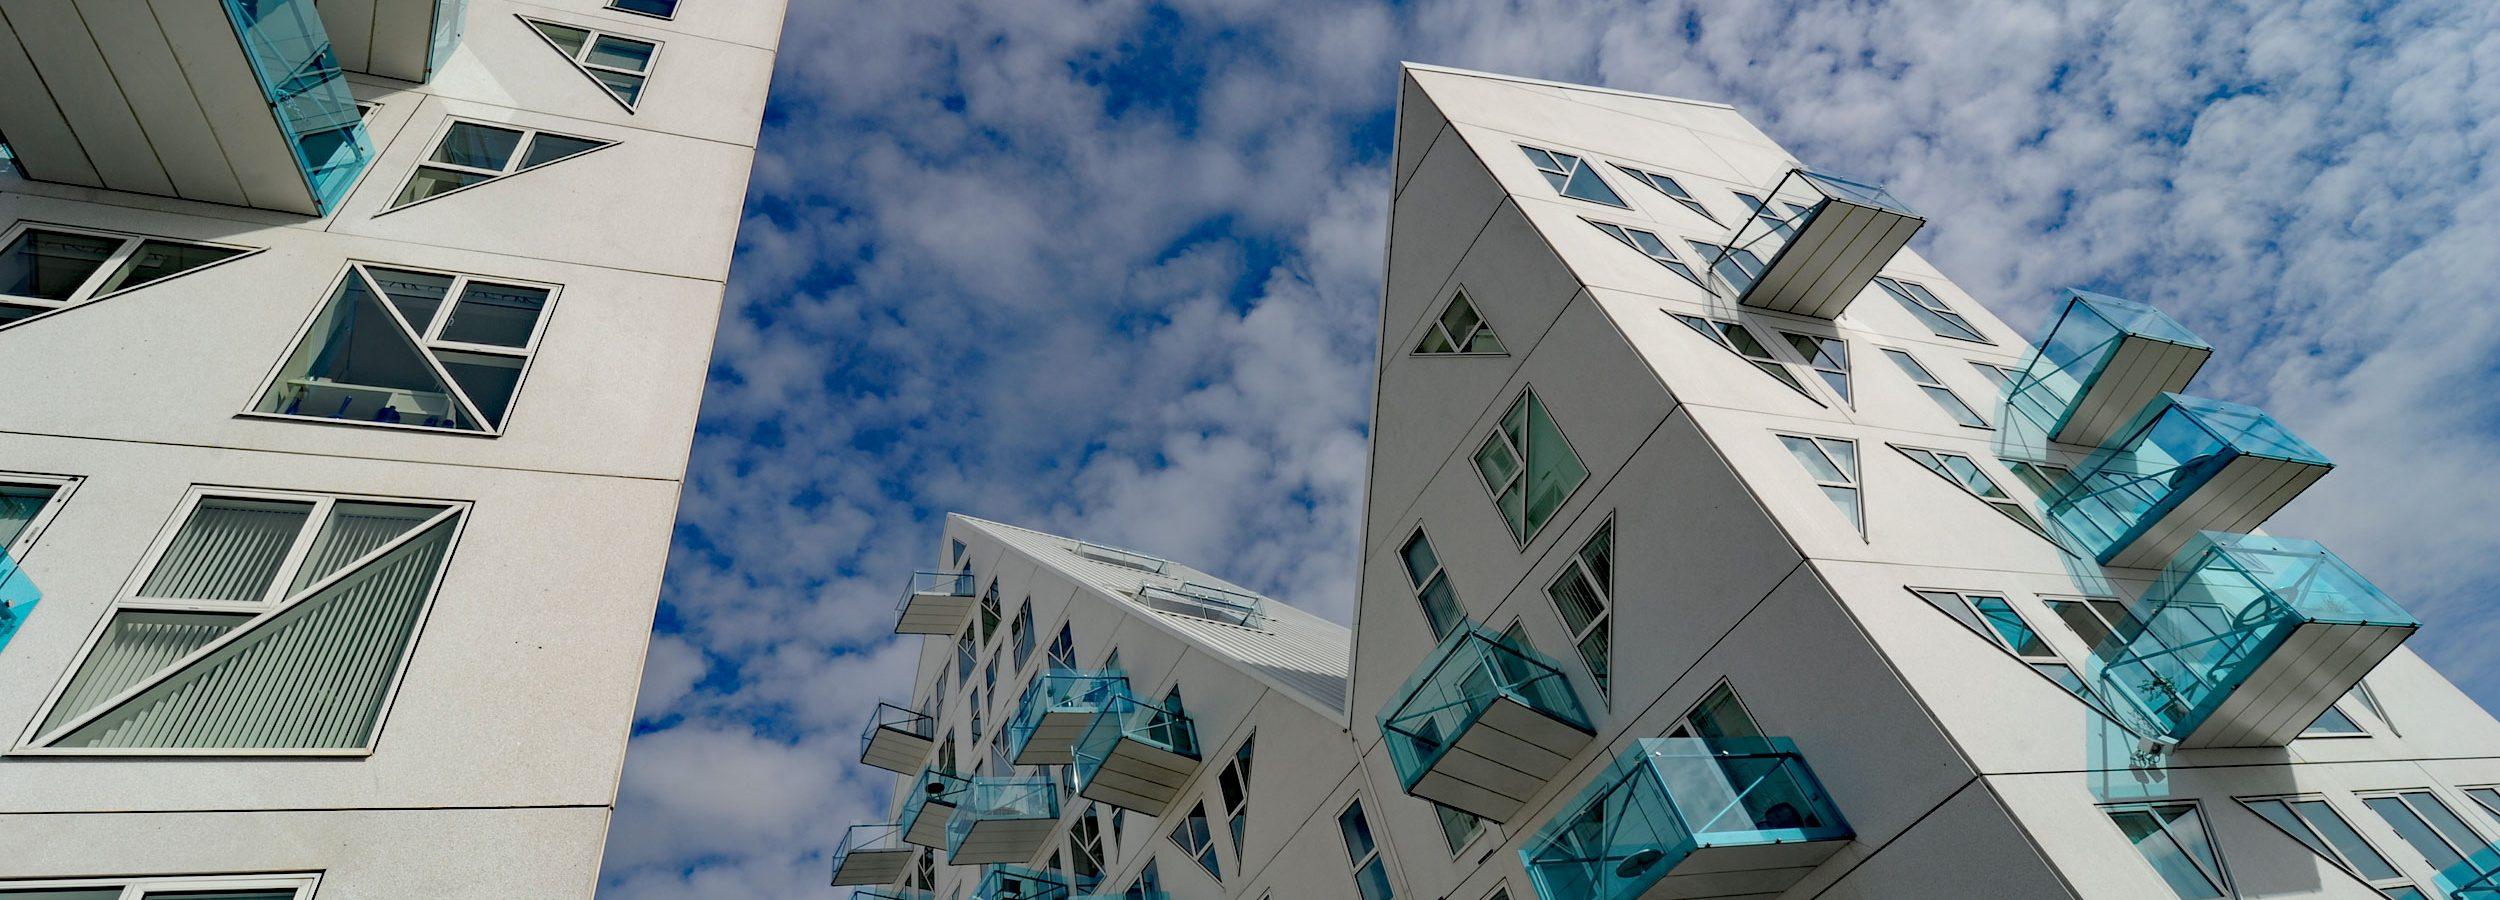 Isbjerget, Aarhus, Dania